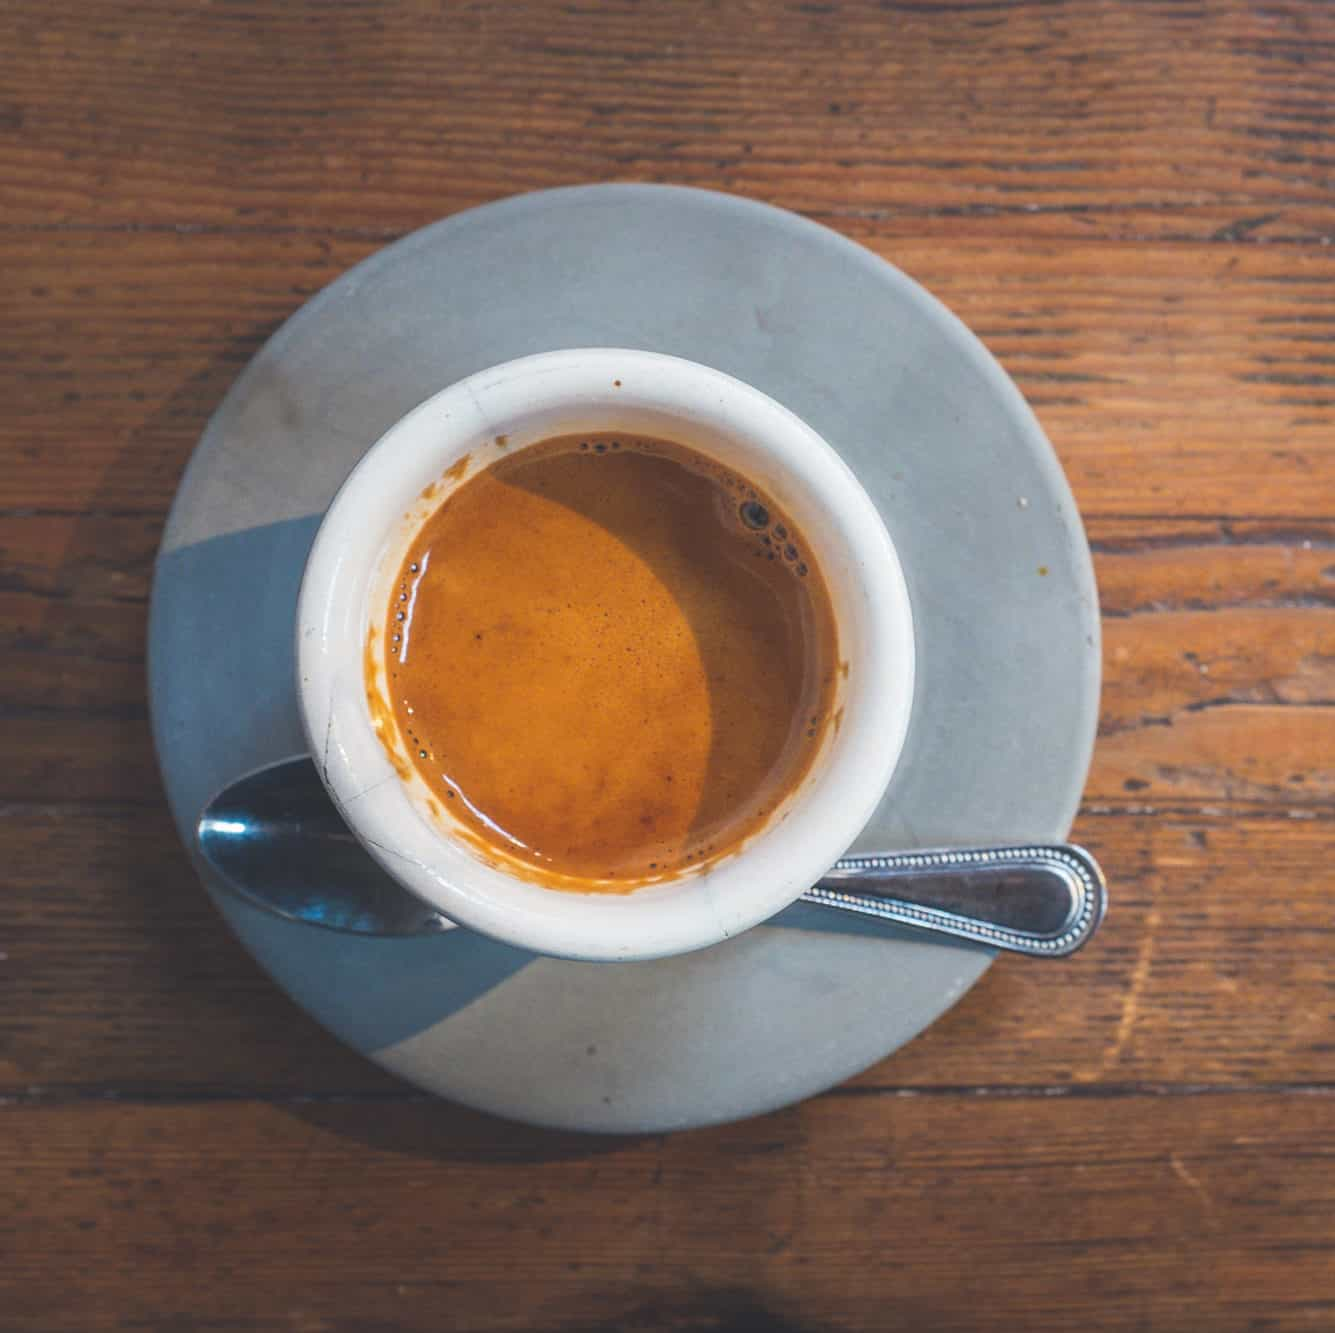 ceramic or glass coffee